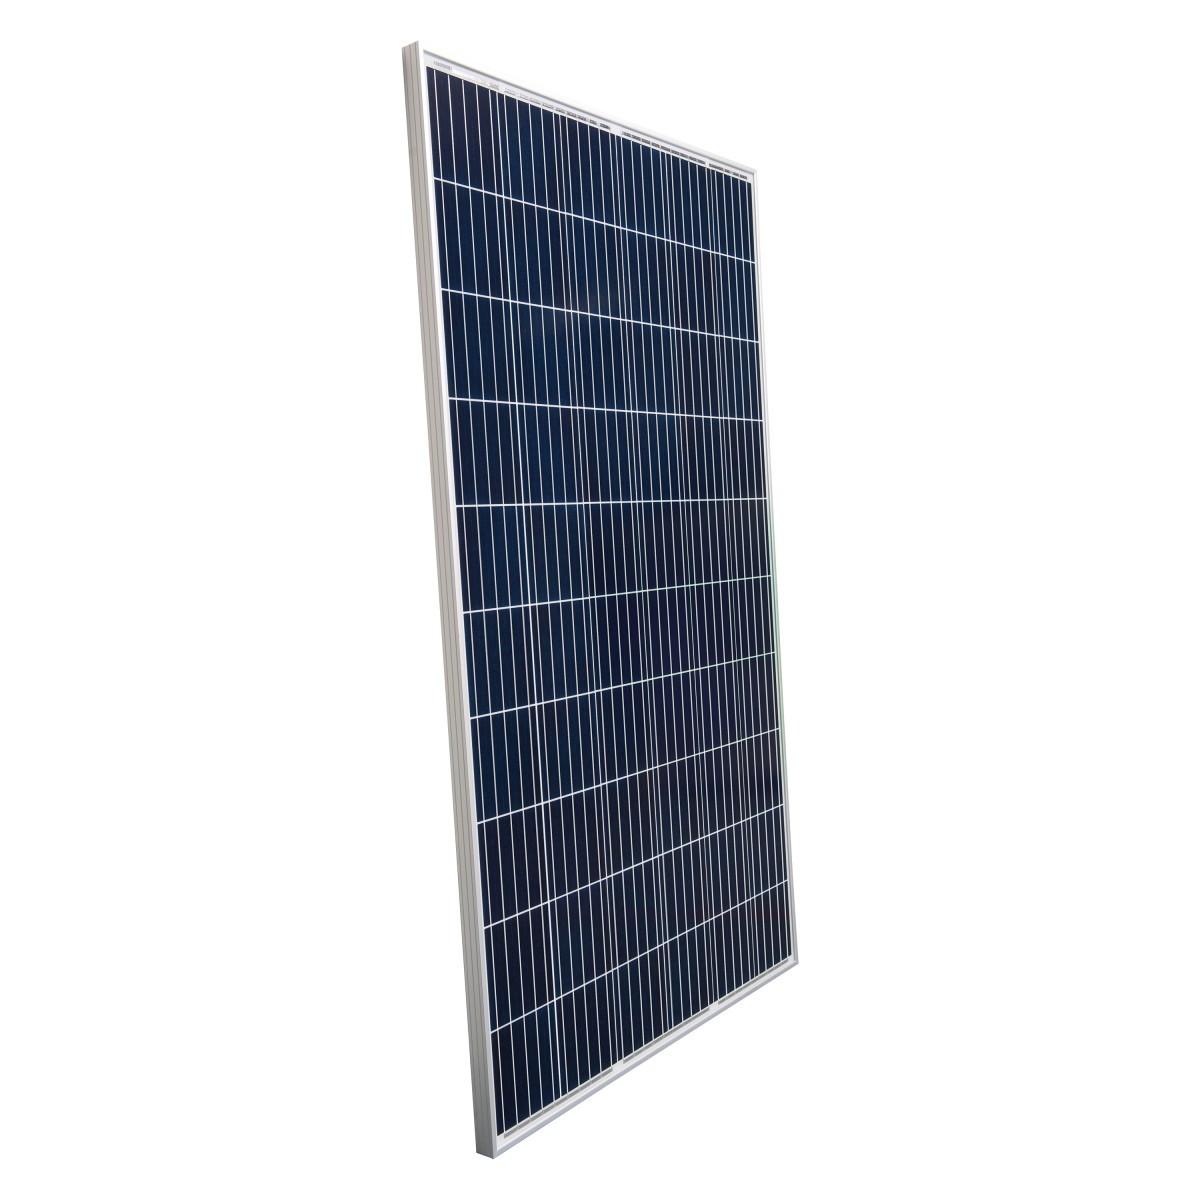 Солнечная батарея Suntech STP 330-24/Vfw 5BB, 330 Вт (поликристалл)